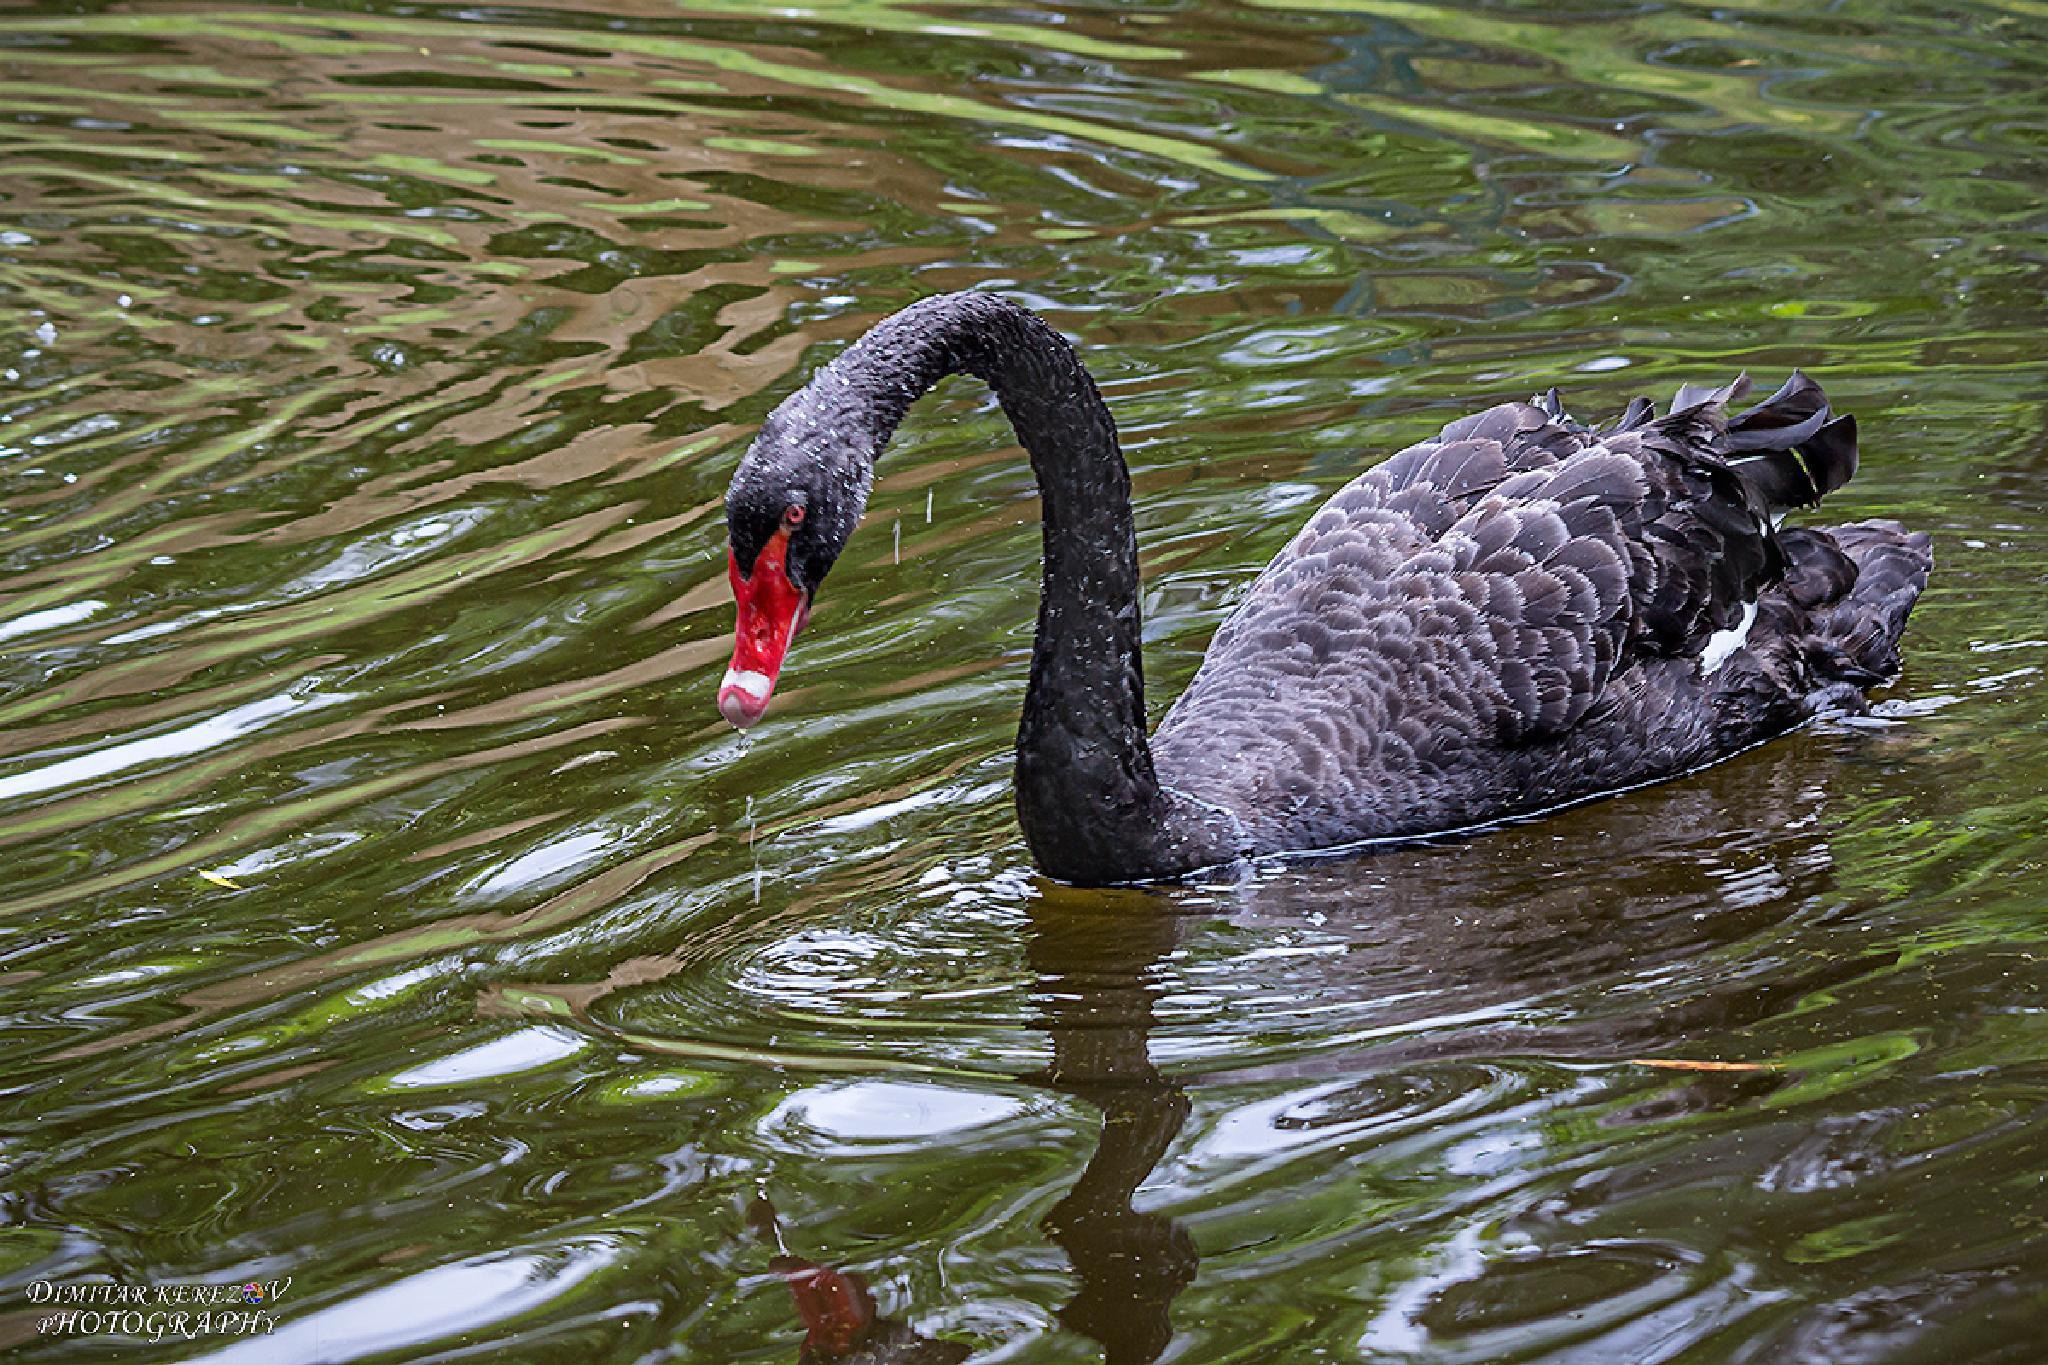 Black Swan by Dimitar Kerezov